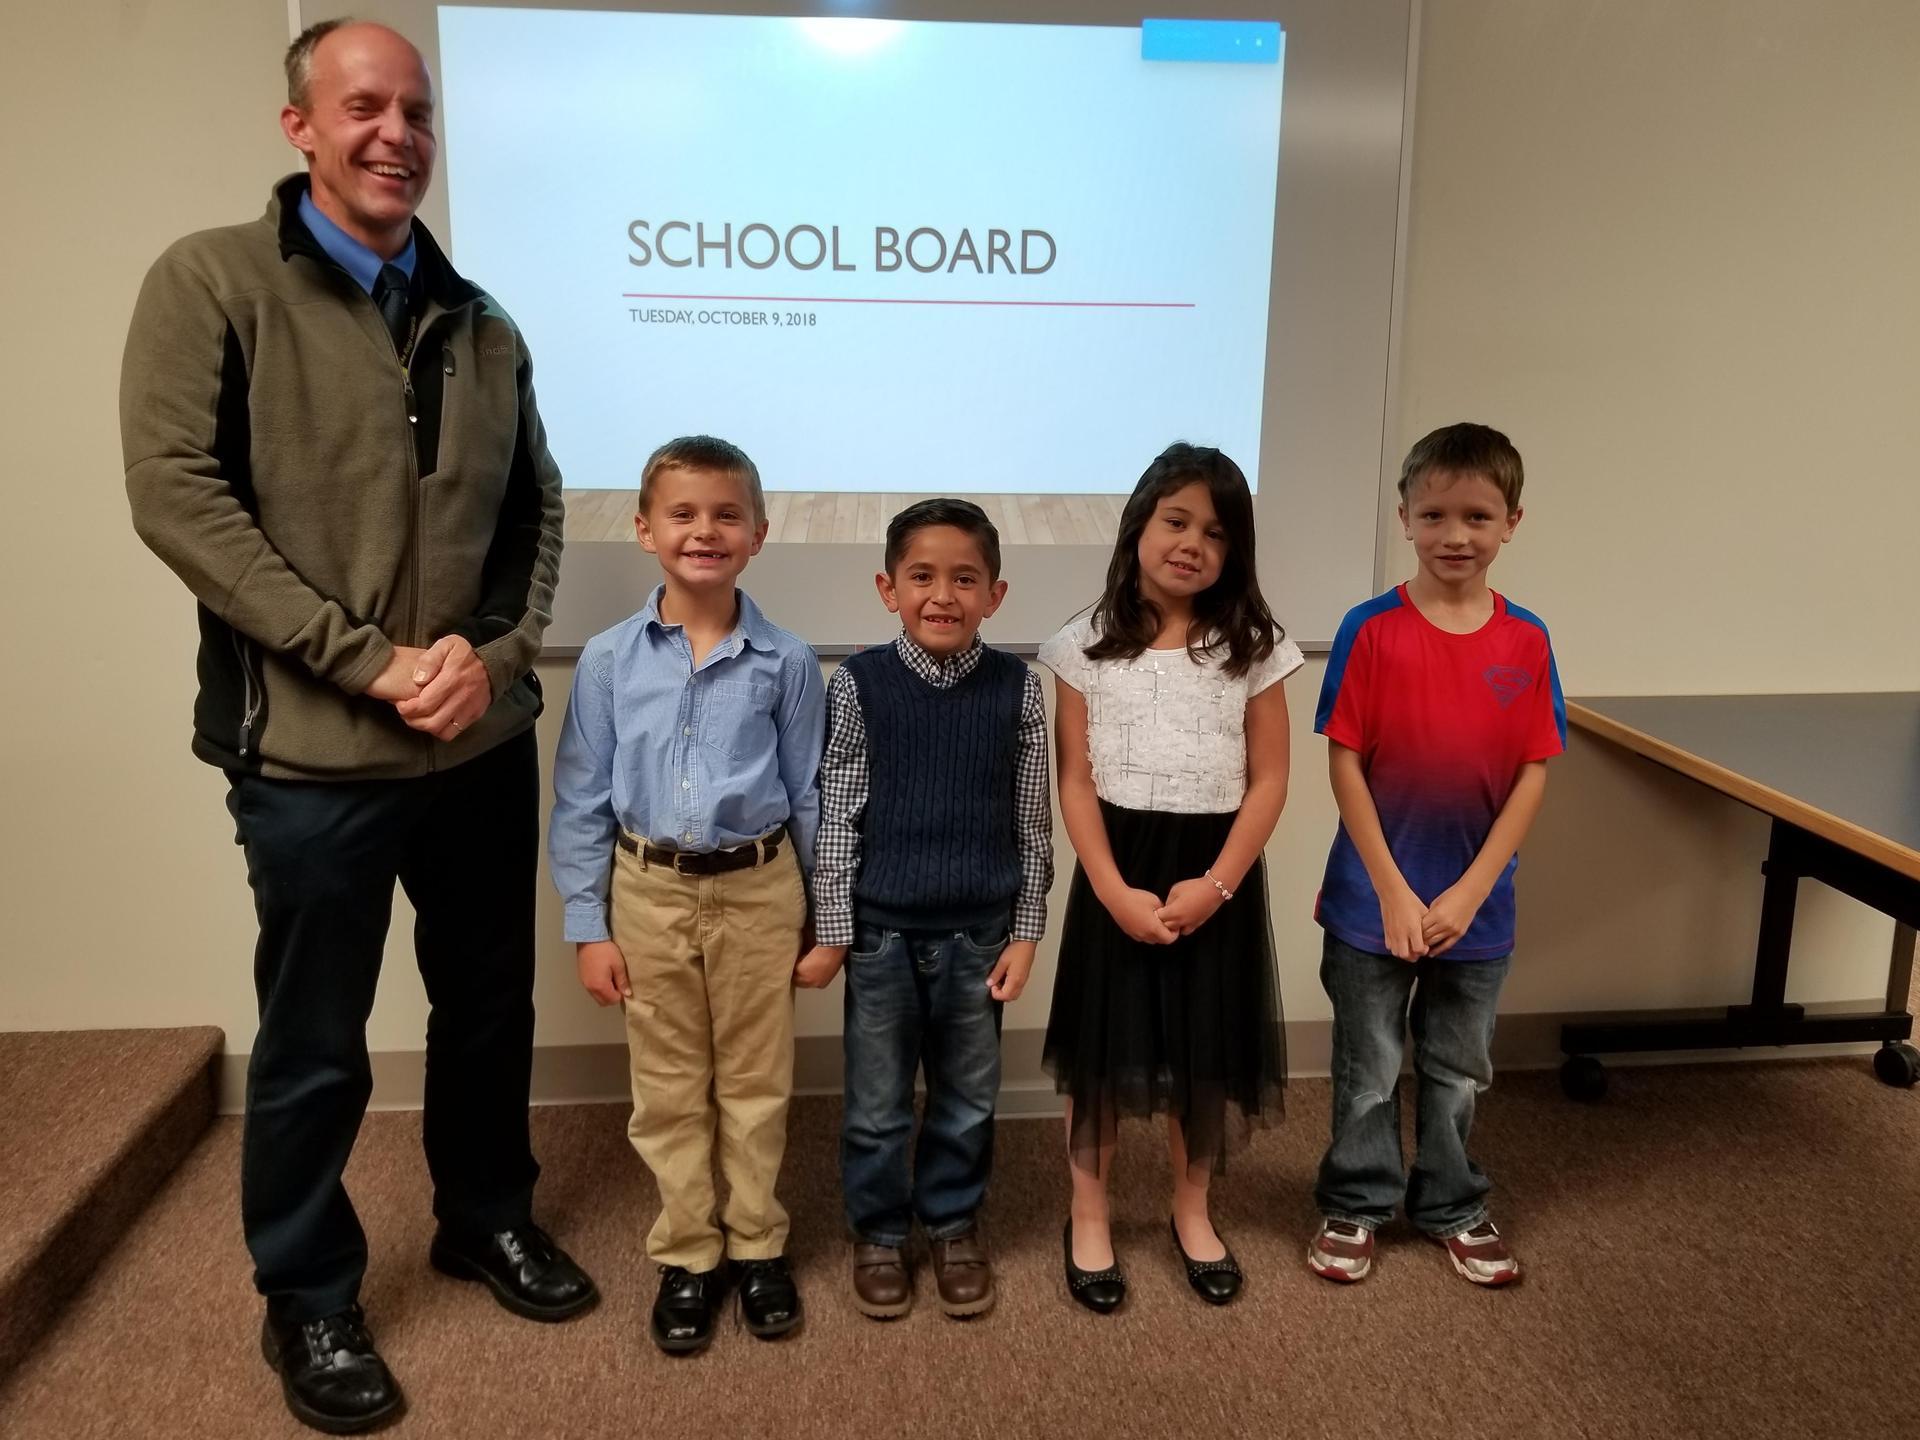 Lake Ridge Principal Steve LaBau poses with students Jude Sears, Alex Alfars, Lana Sim and Camden Burey.